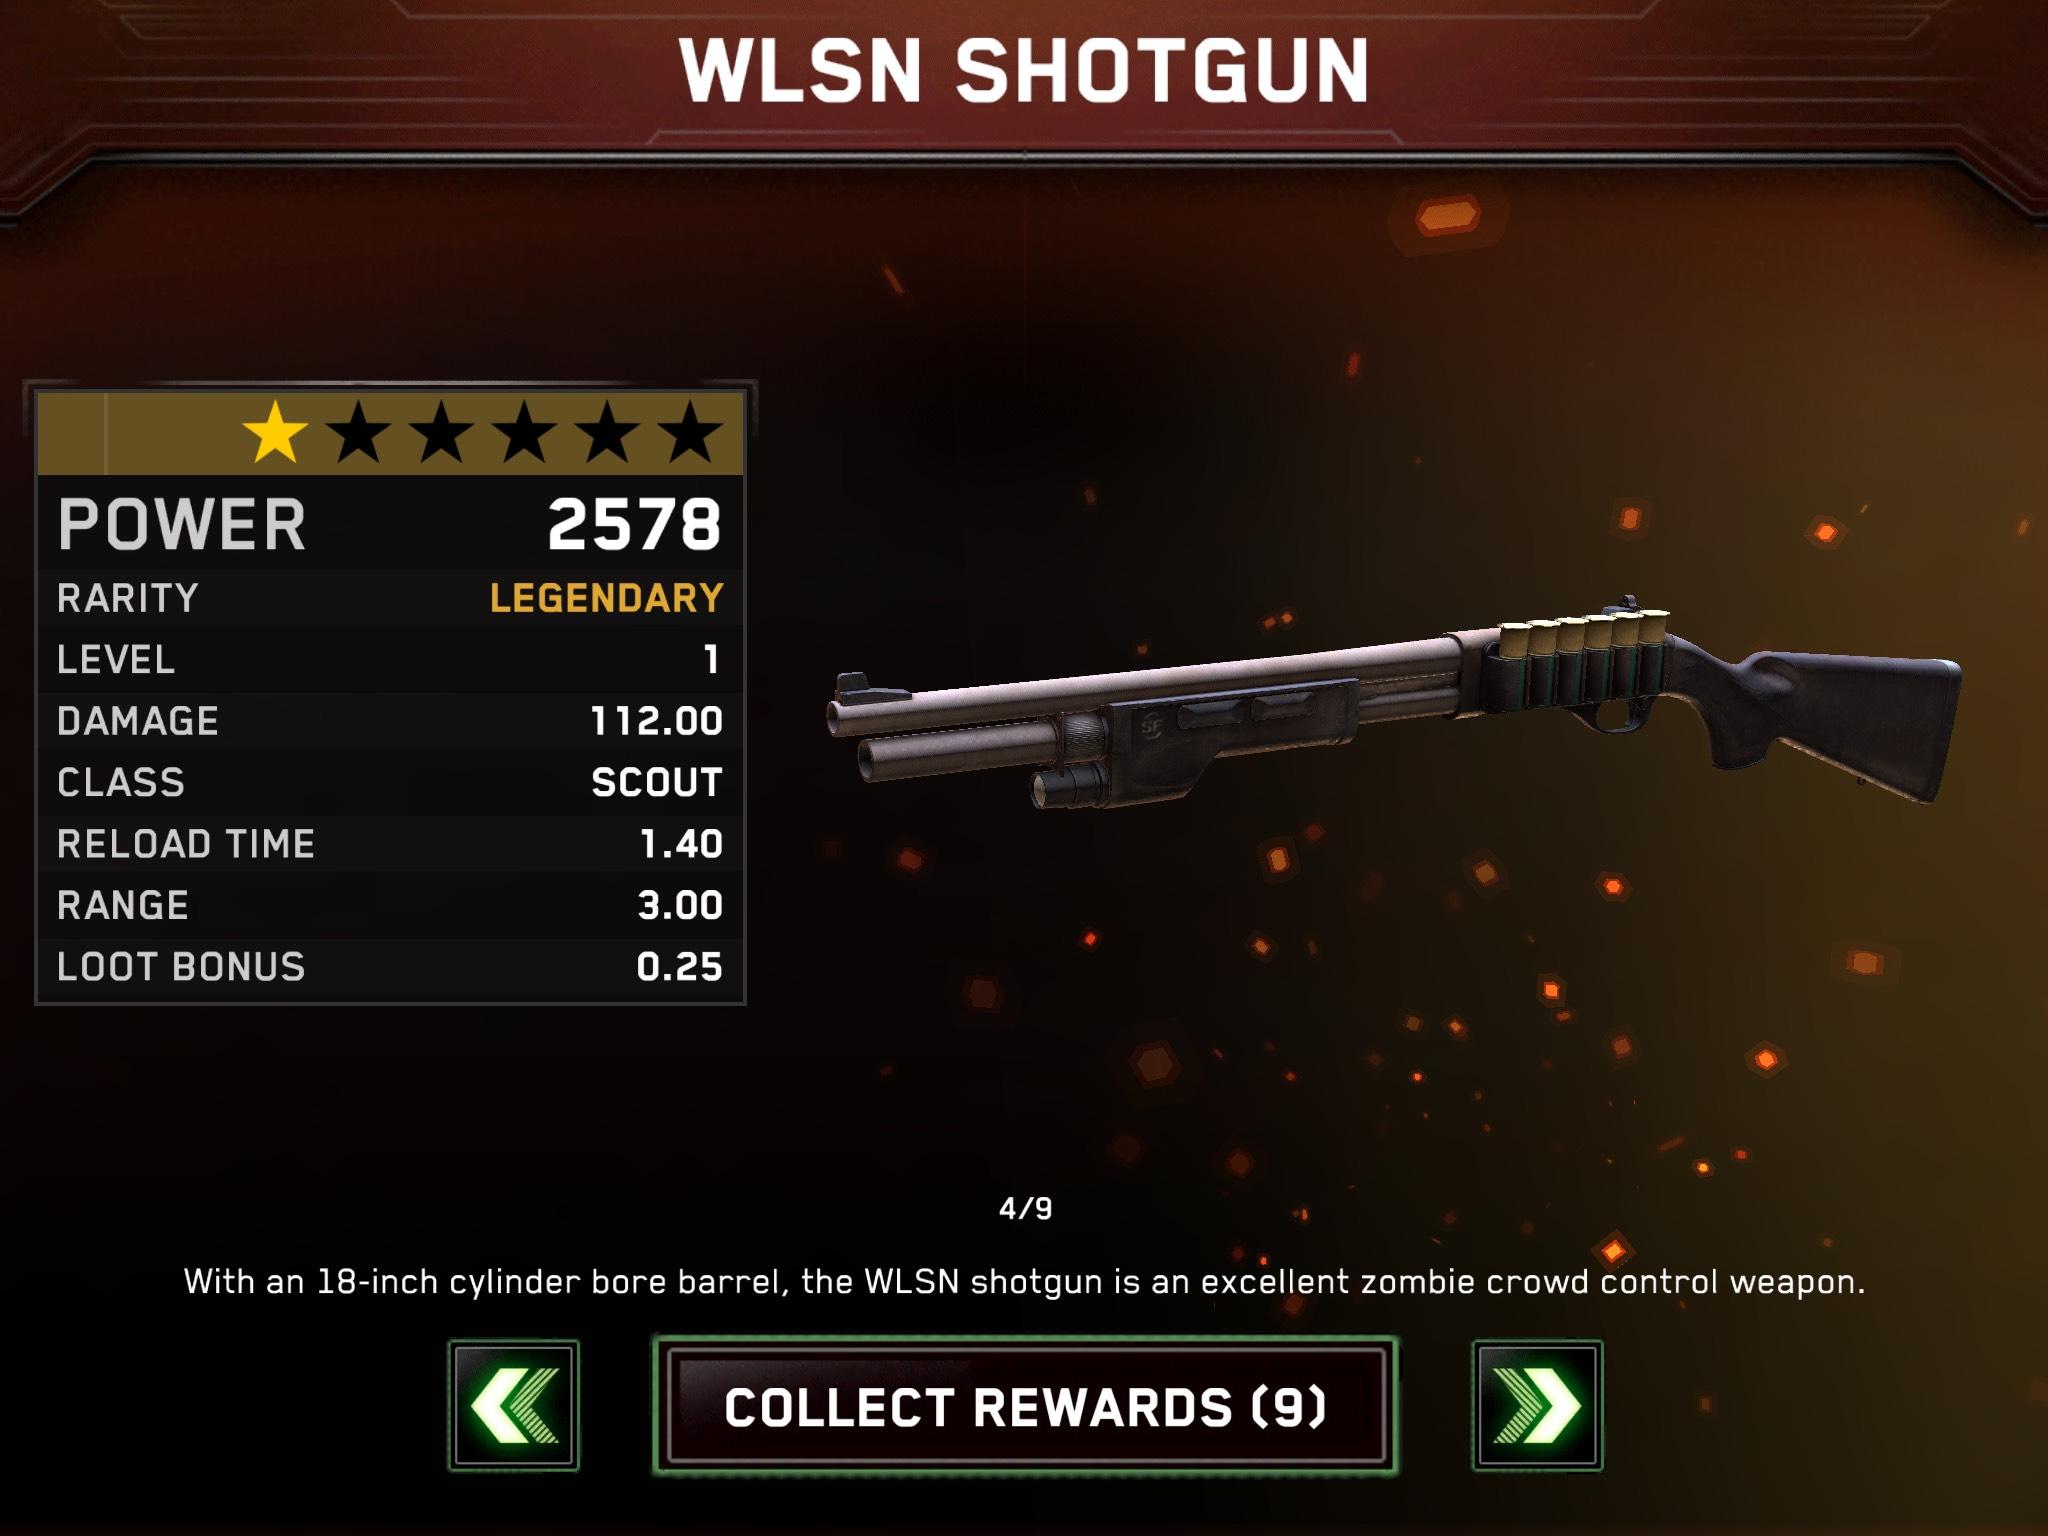 Legendary Wilson Shotgun!